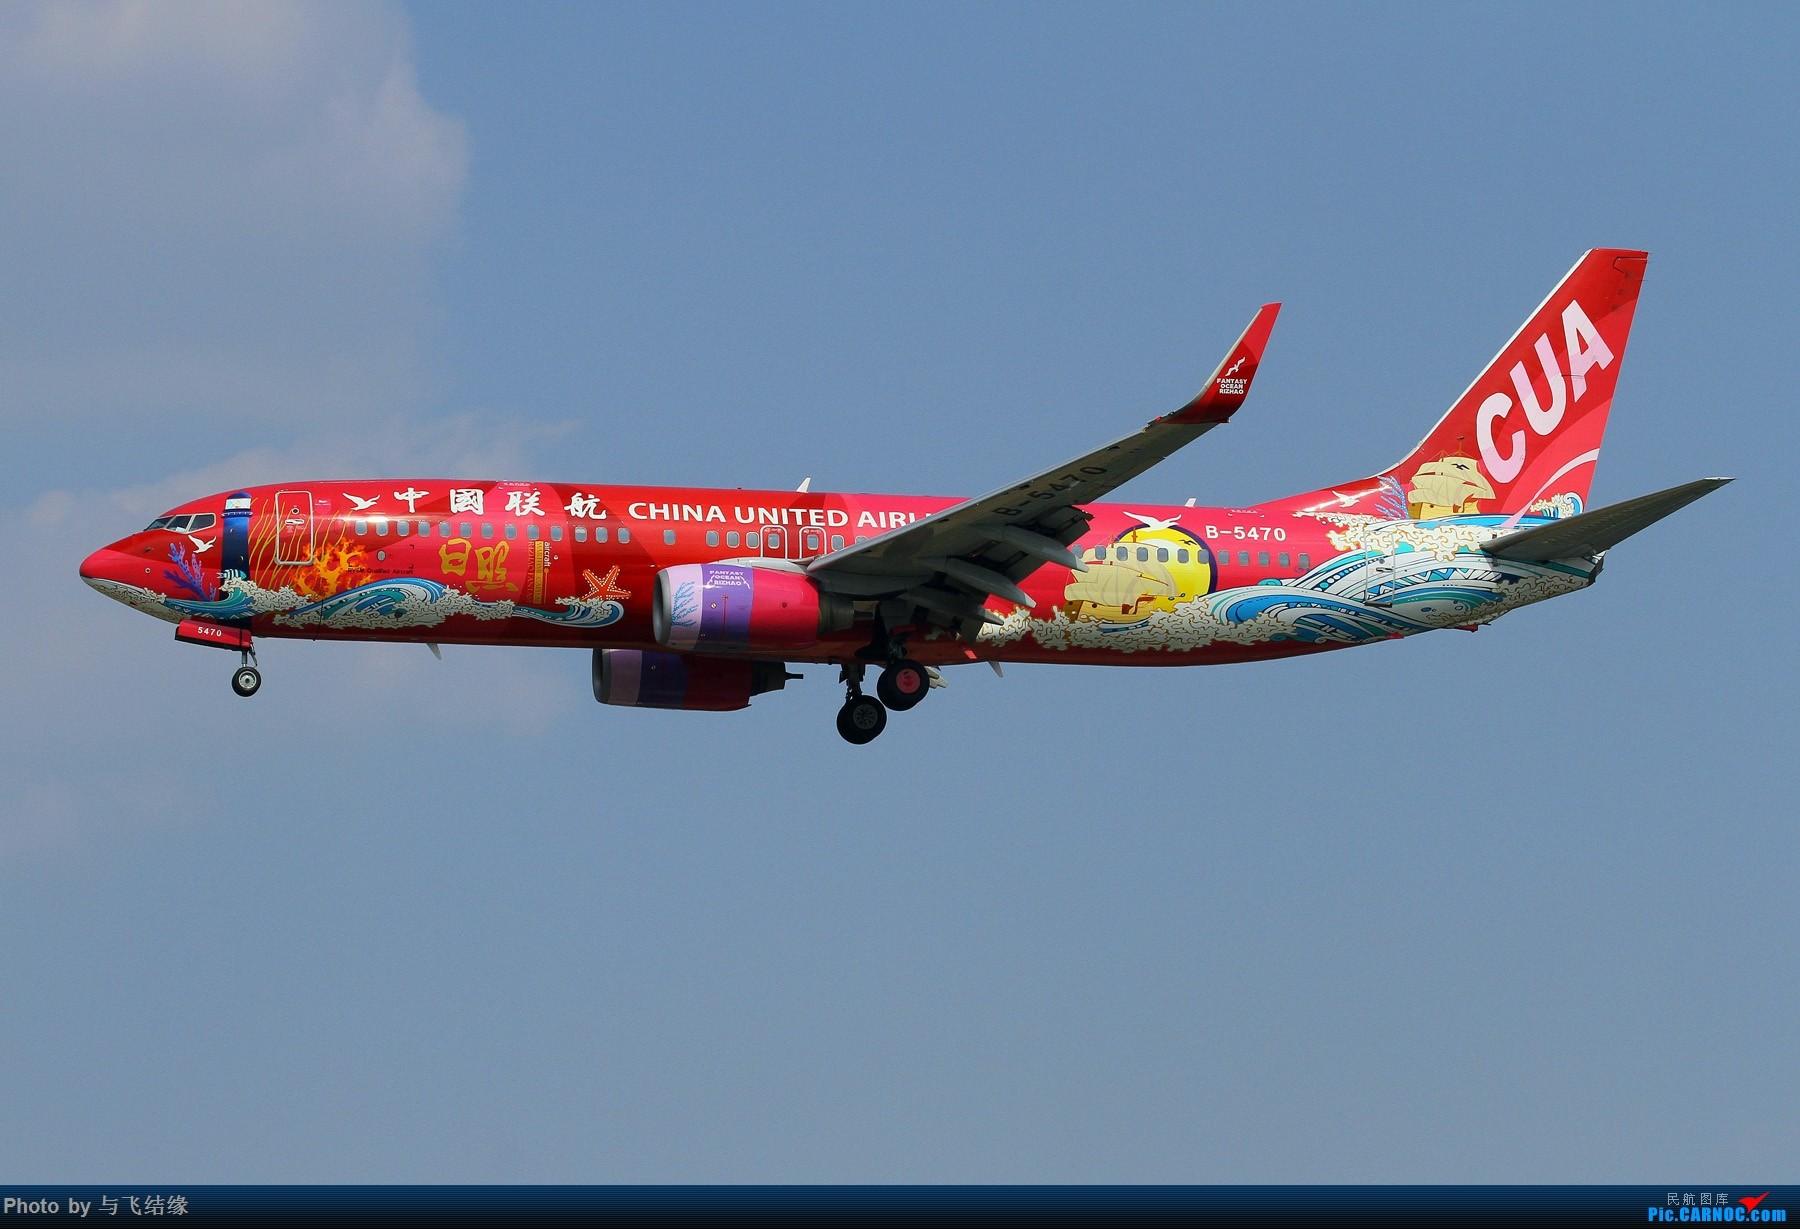 Re:[原创]要问彩绘哪家强,中国北京找联航。 BOEING 737-800 B-5470 中国北京南苑机场